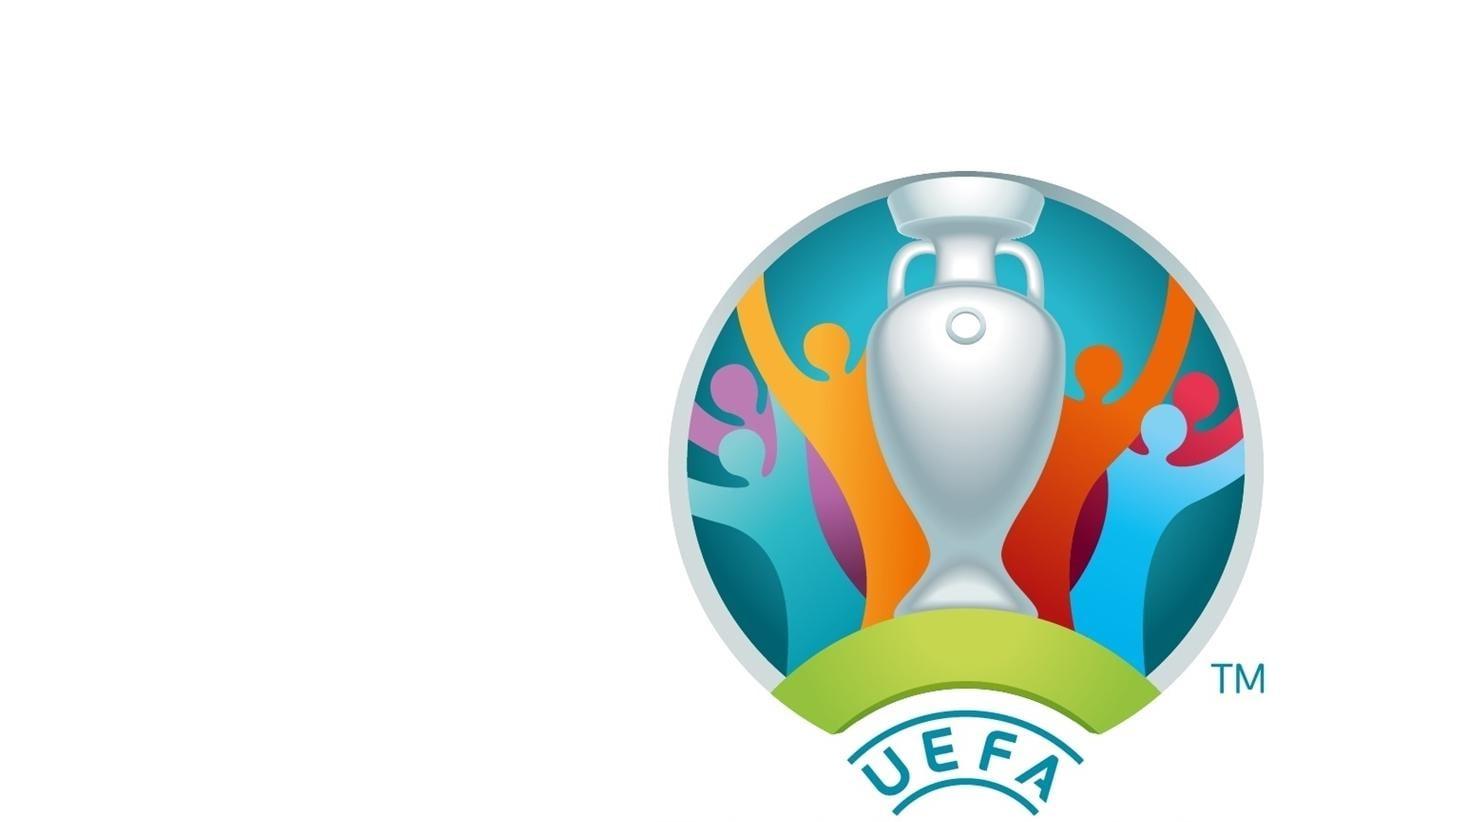 Uefa Calendrier 2020.L Identite Visuelle De L Euro 2020 Devoilee Uefa Euro 2020